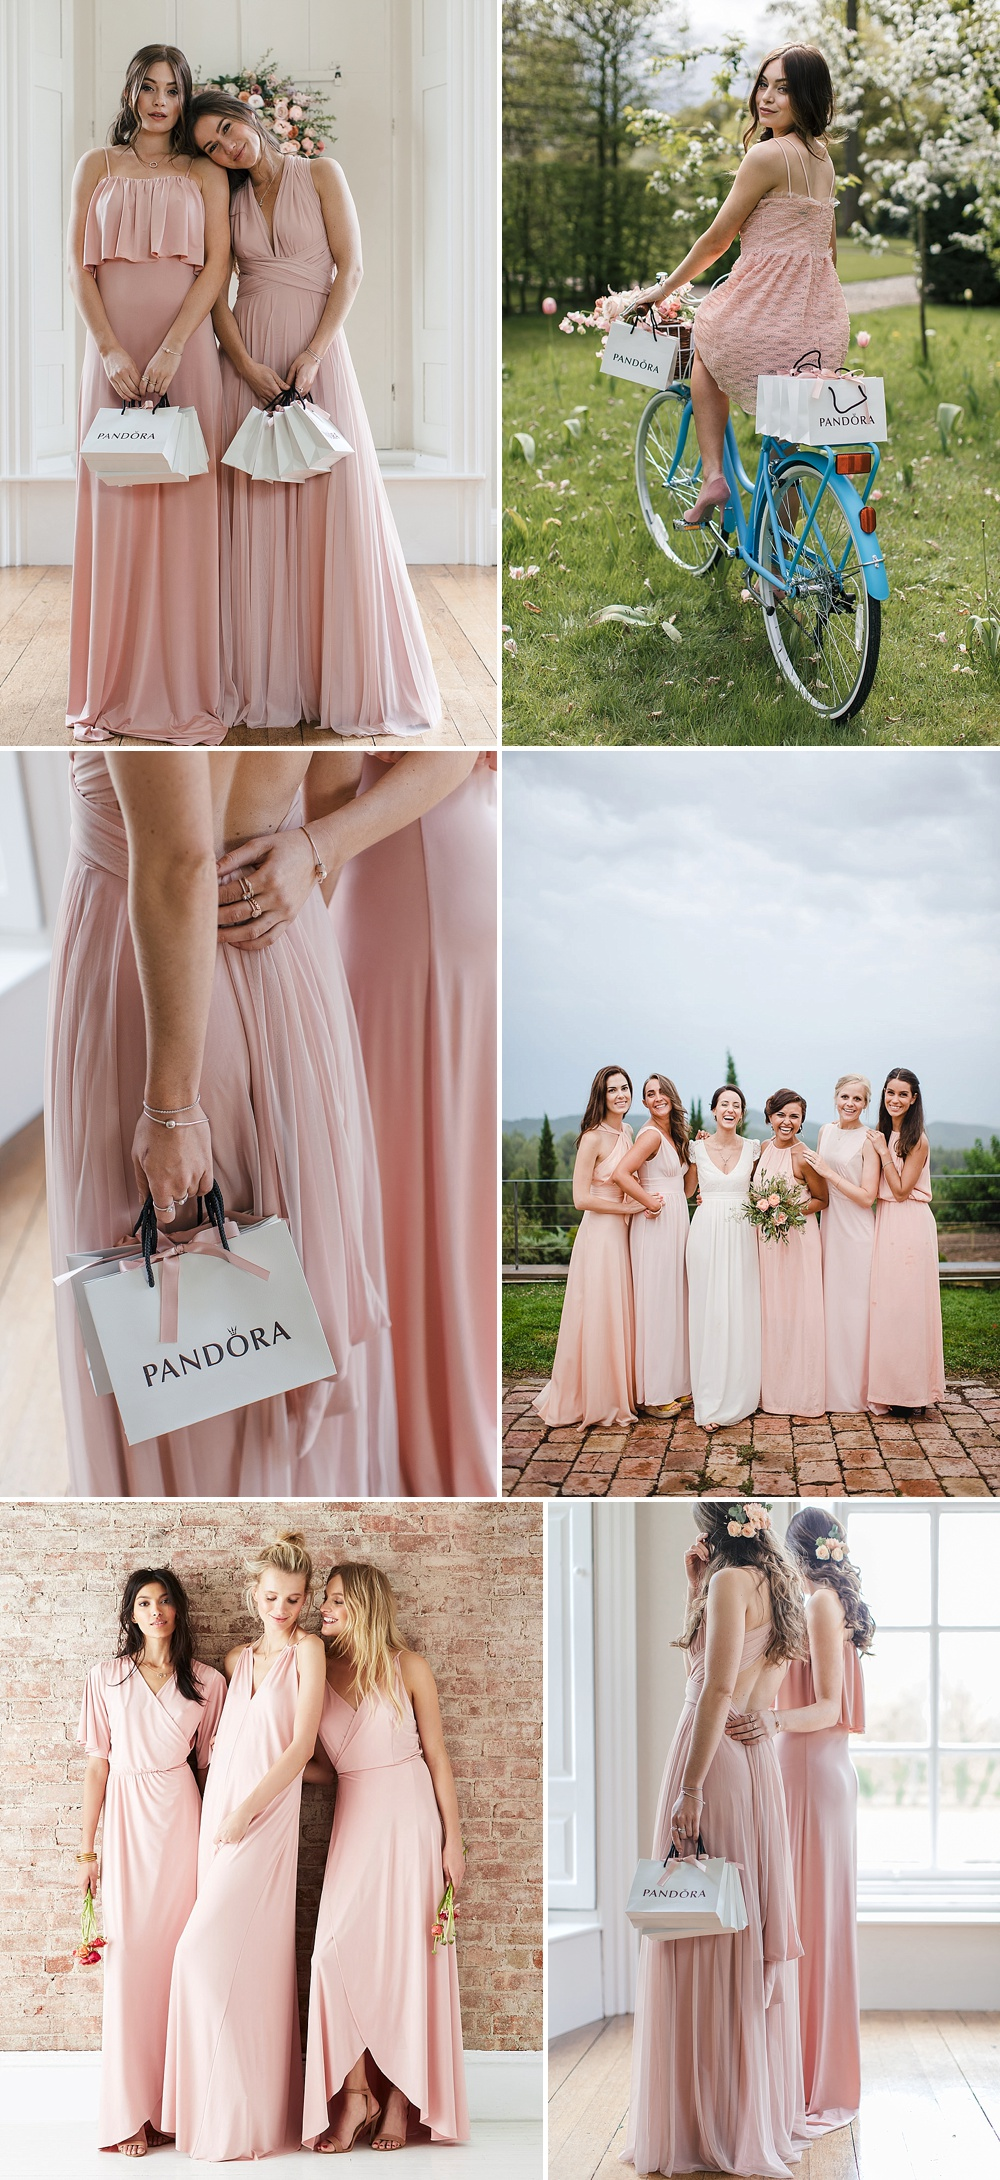 Blush Pink Bridesmaids Dresses